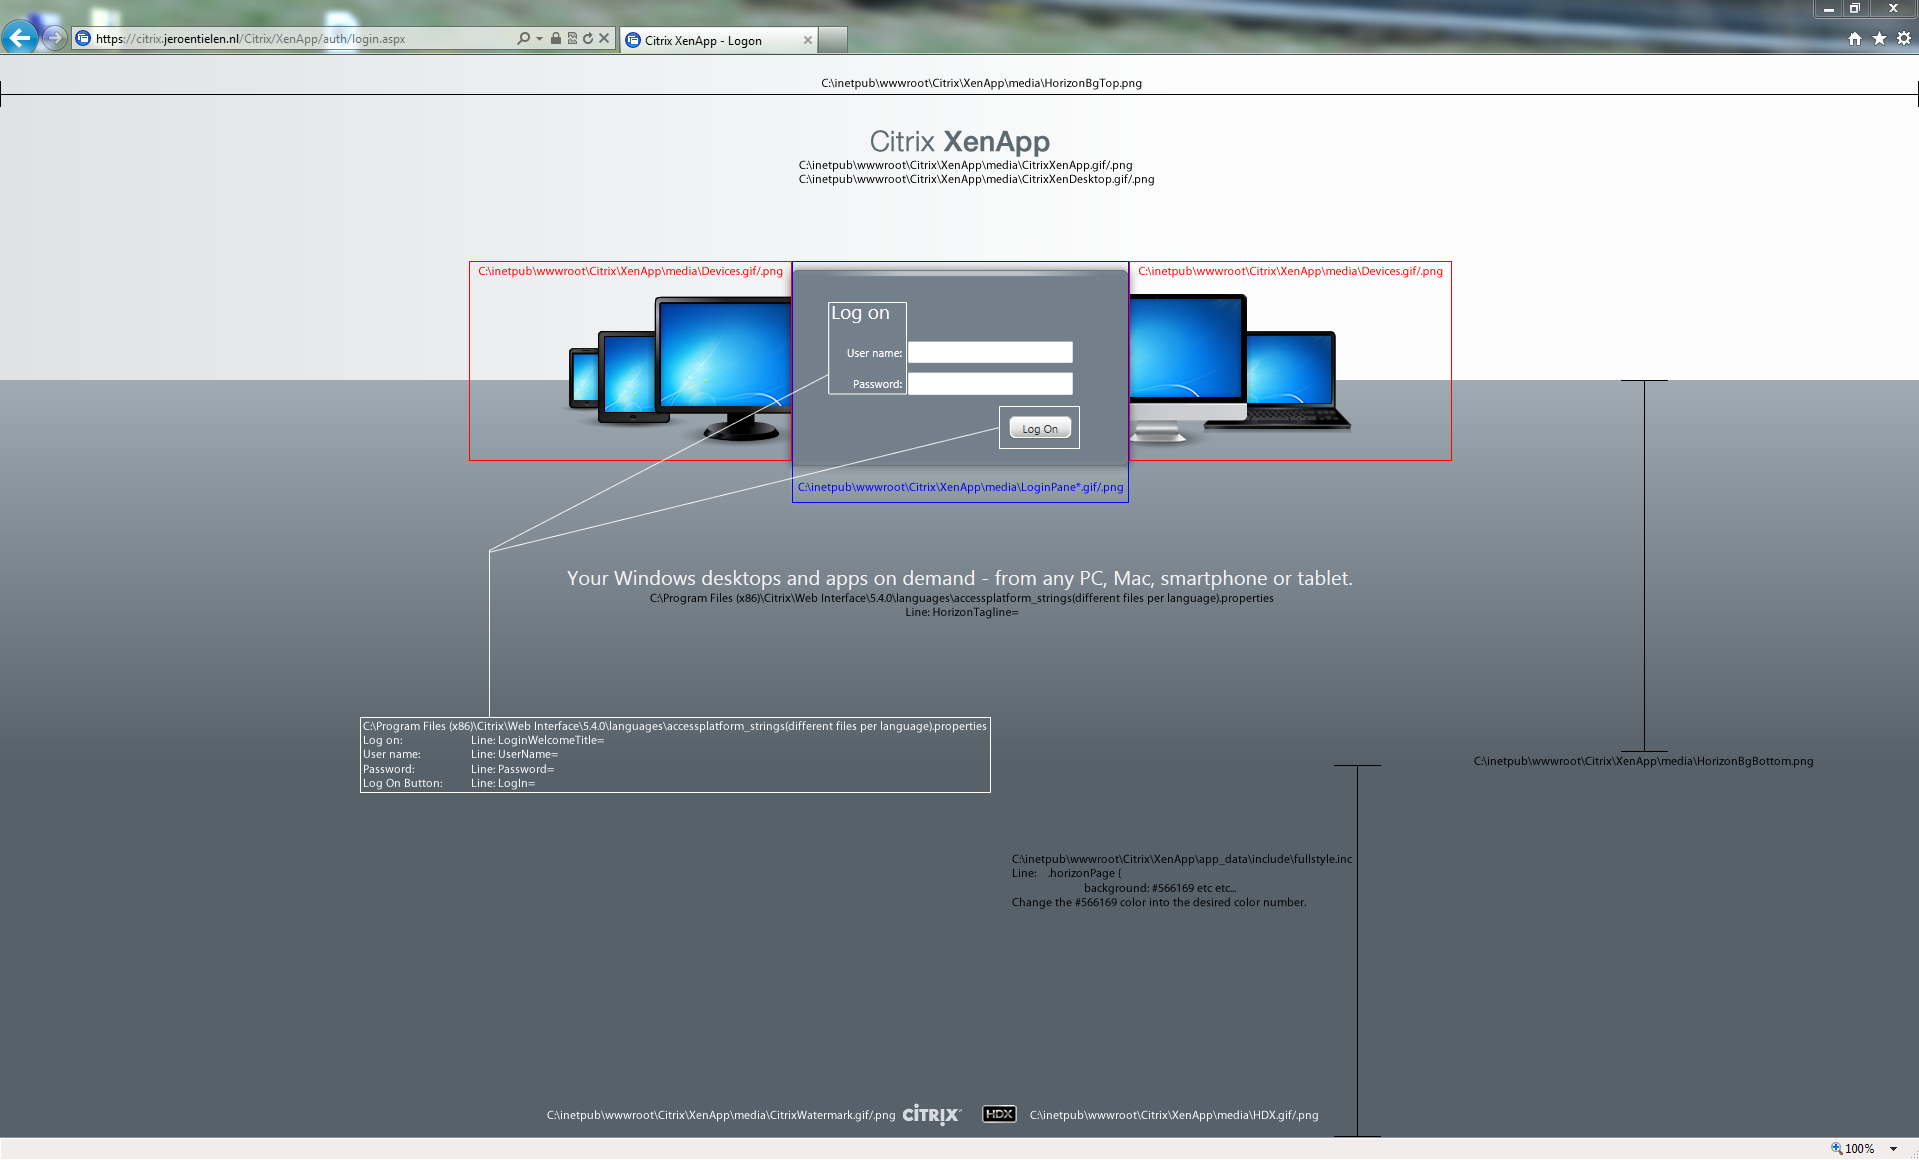 web screen: